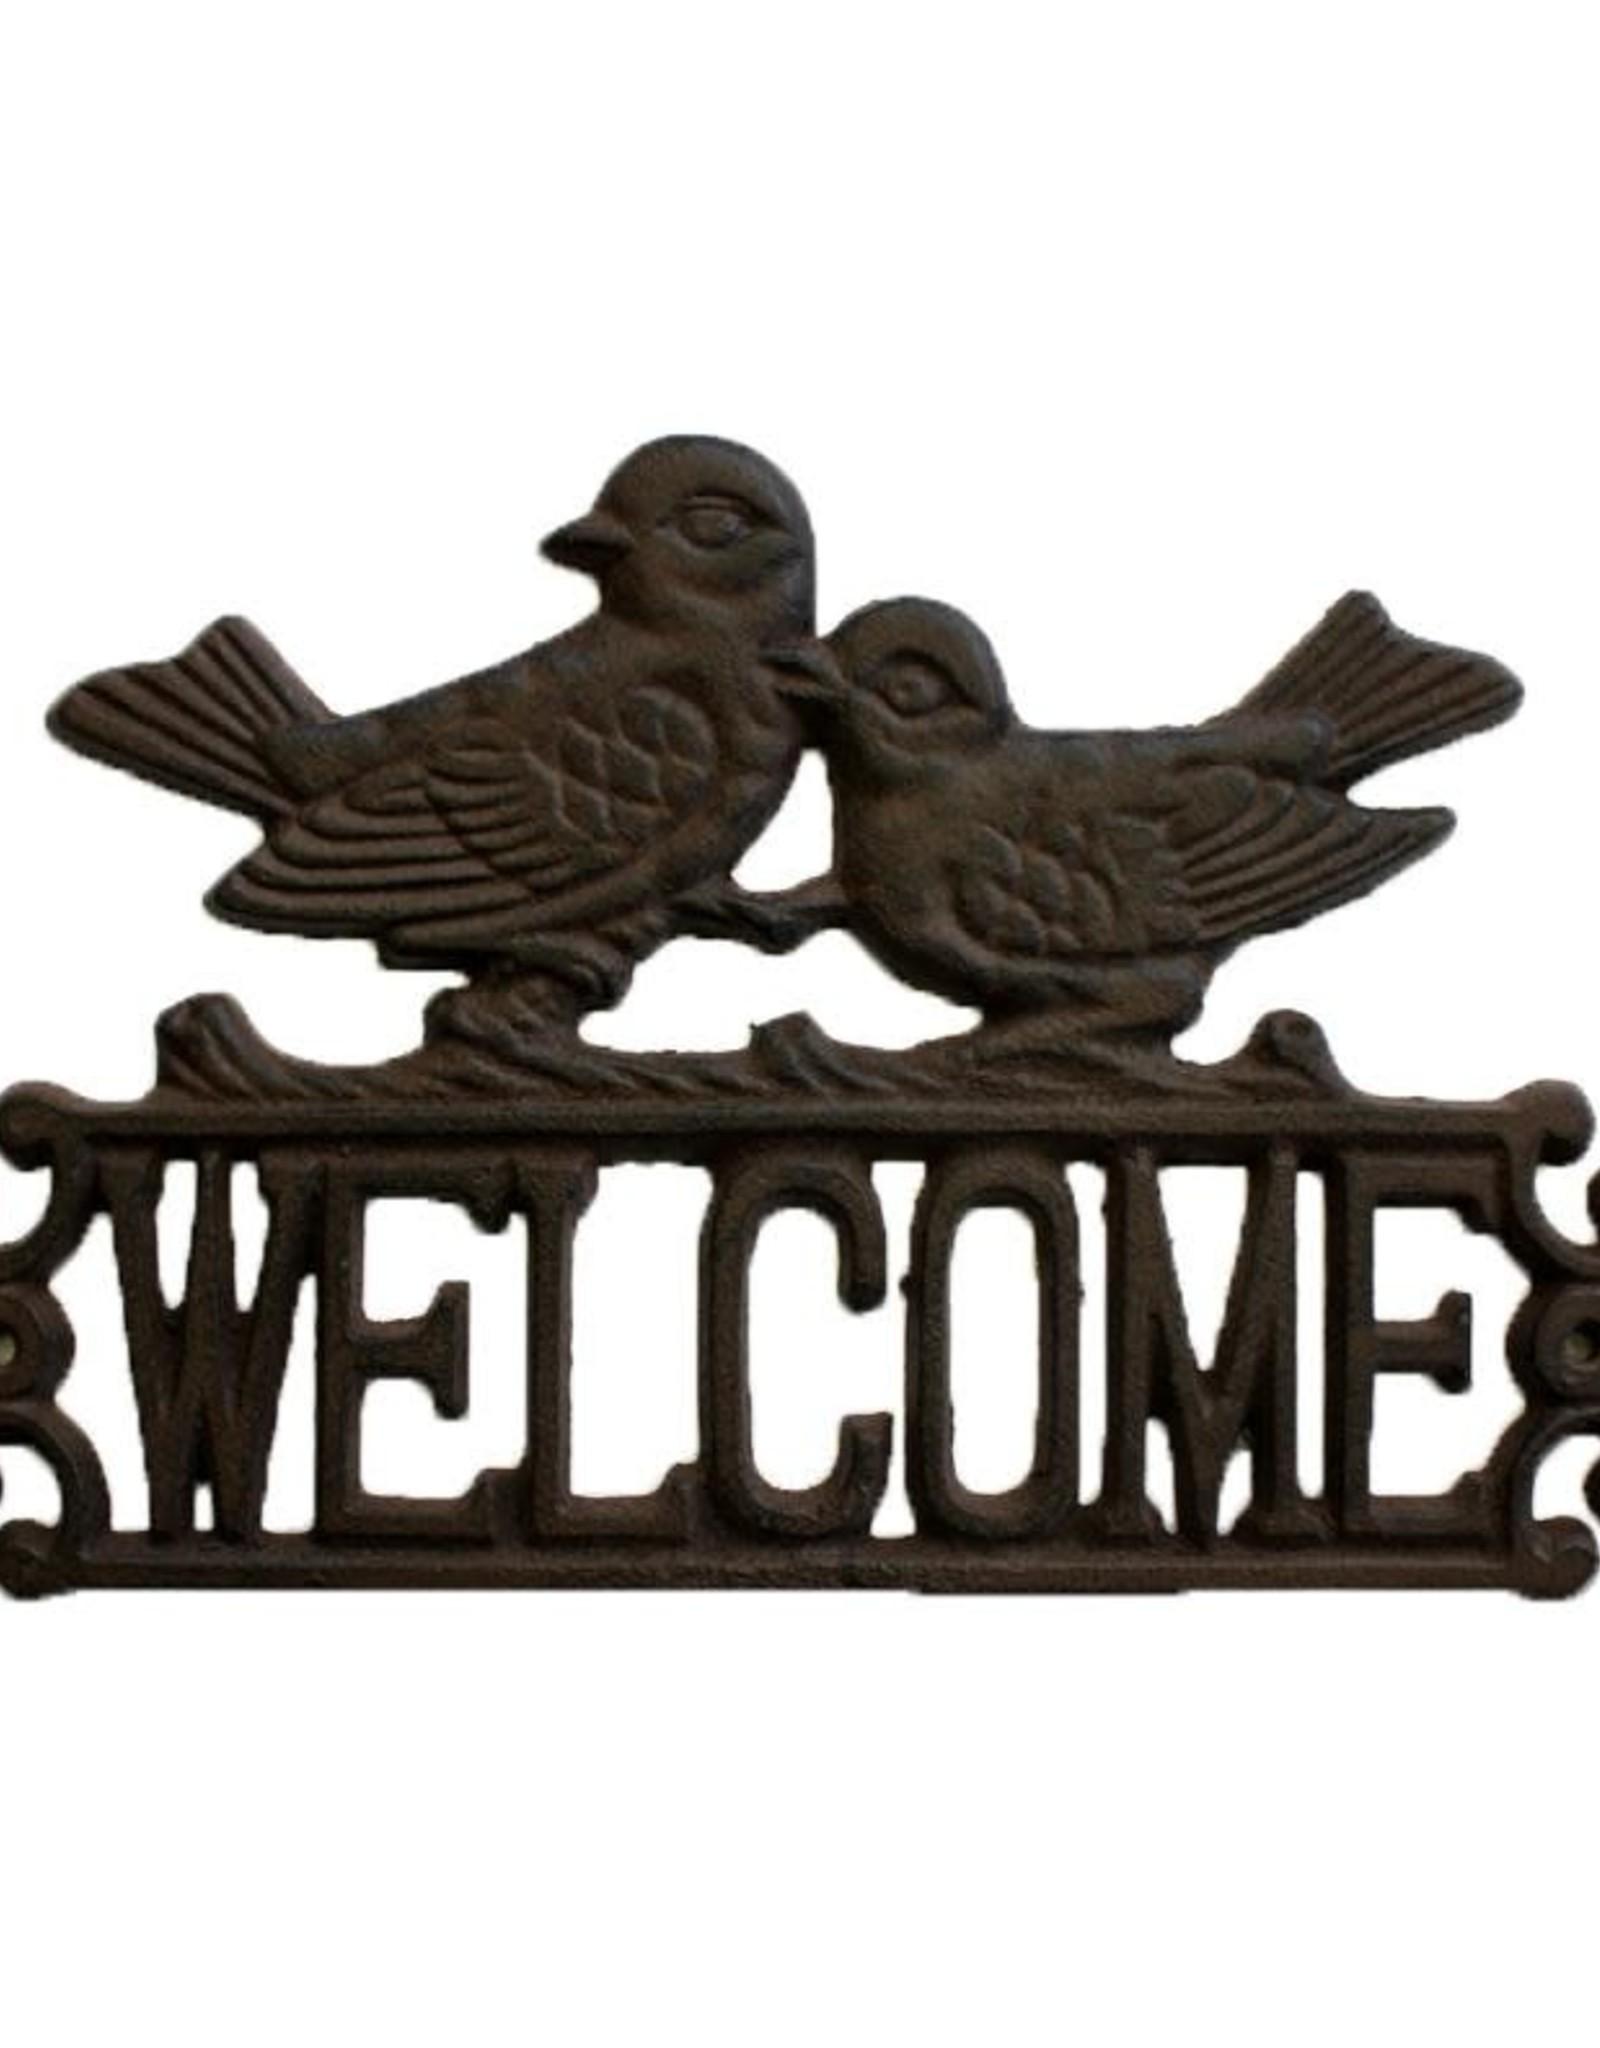 Cast Iron Welcome Bird Sign